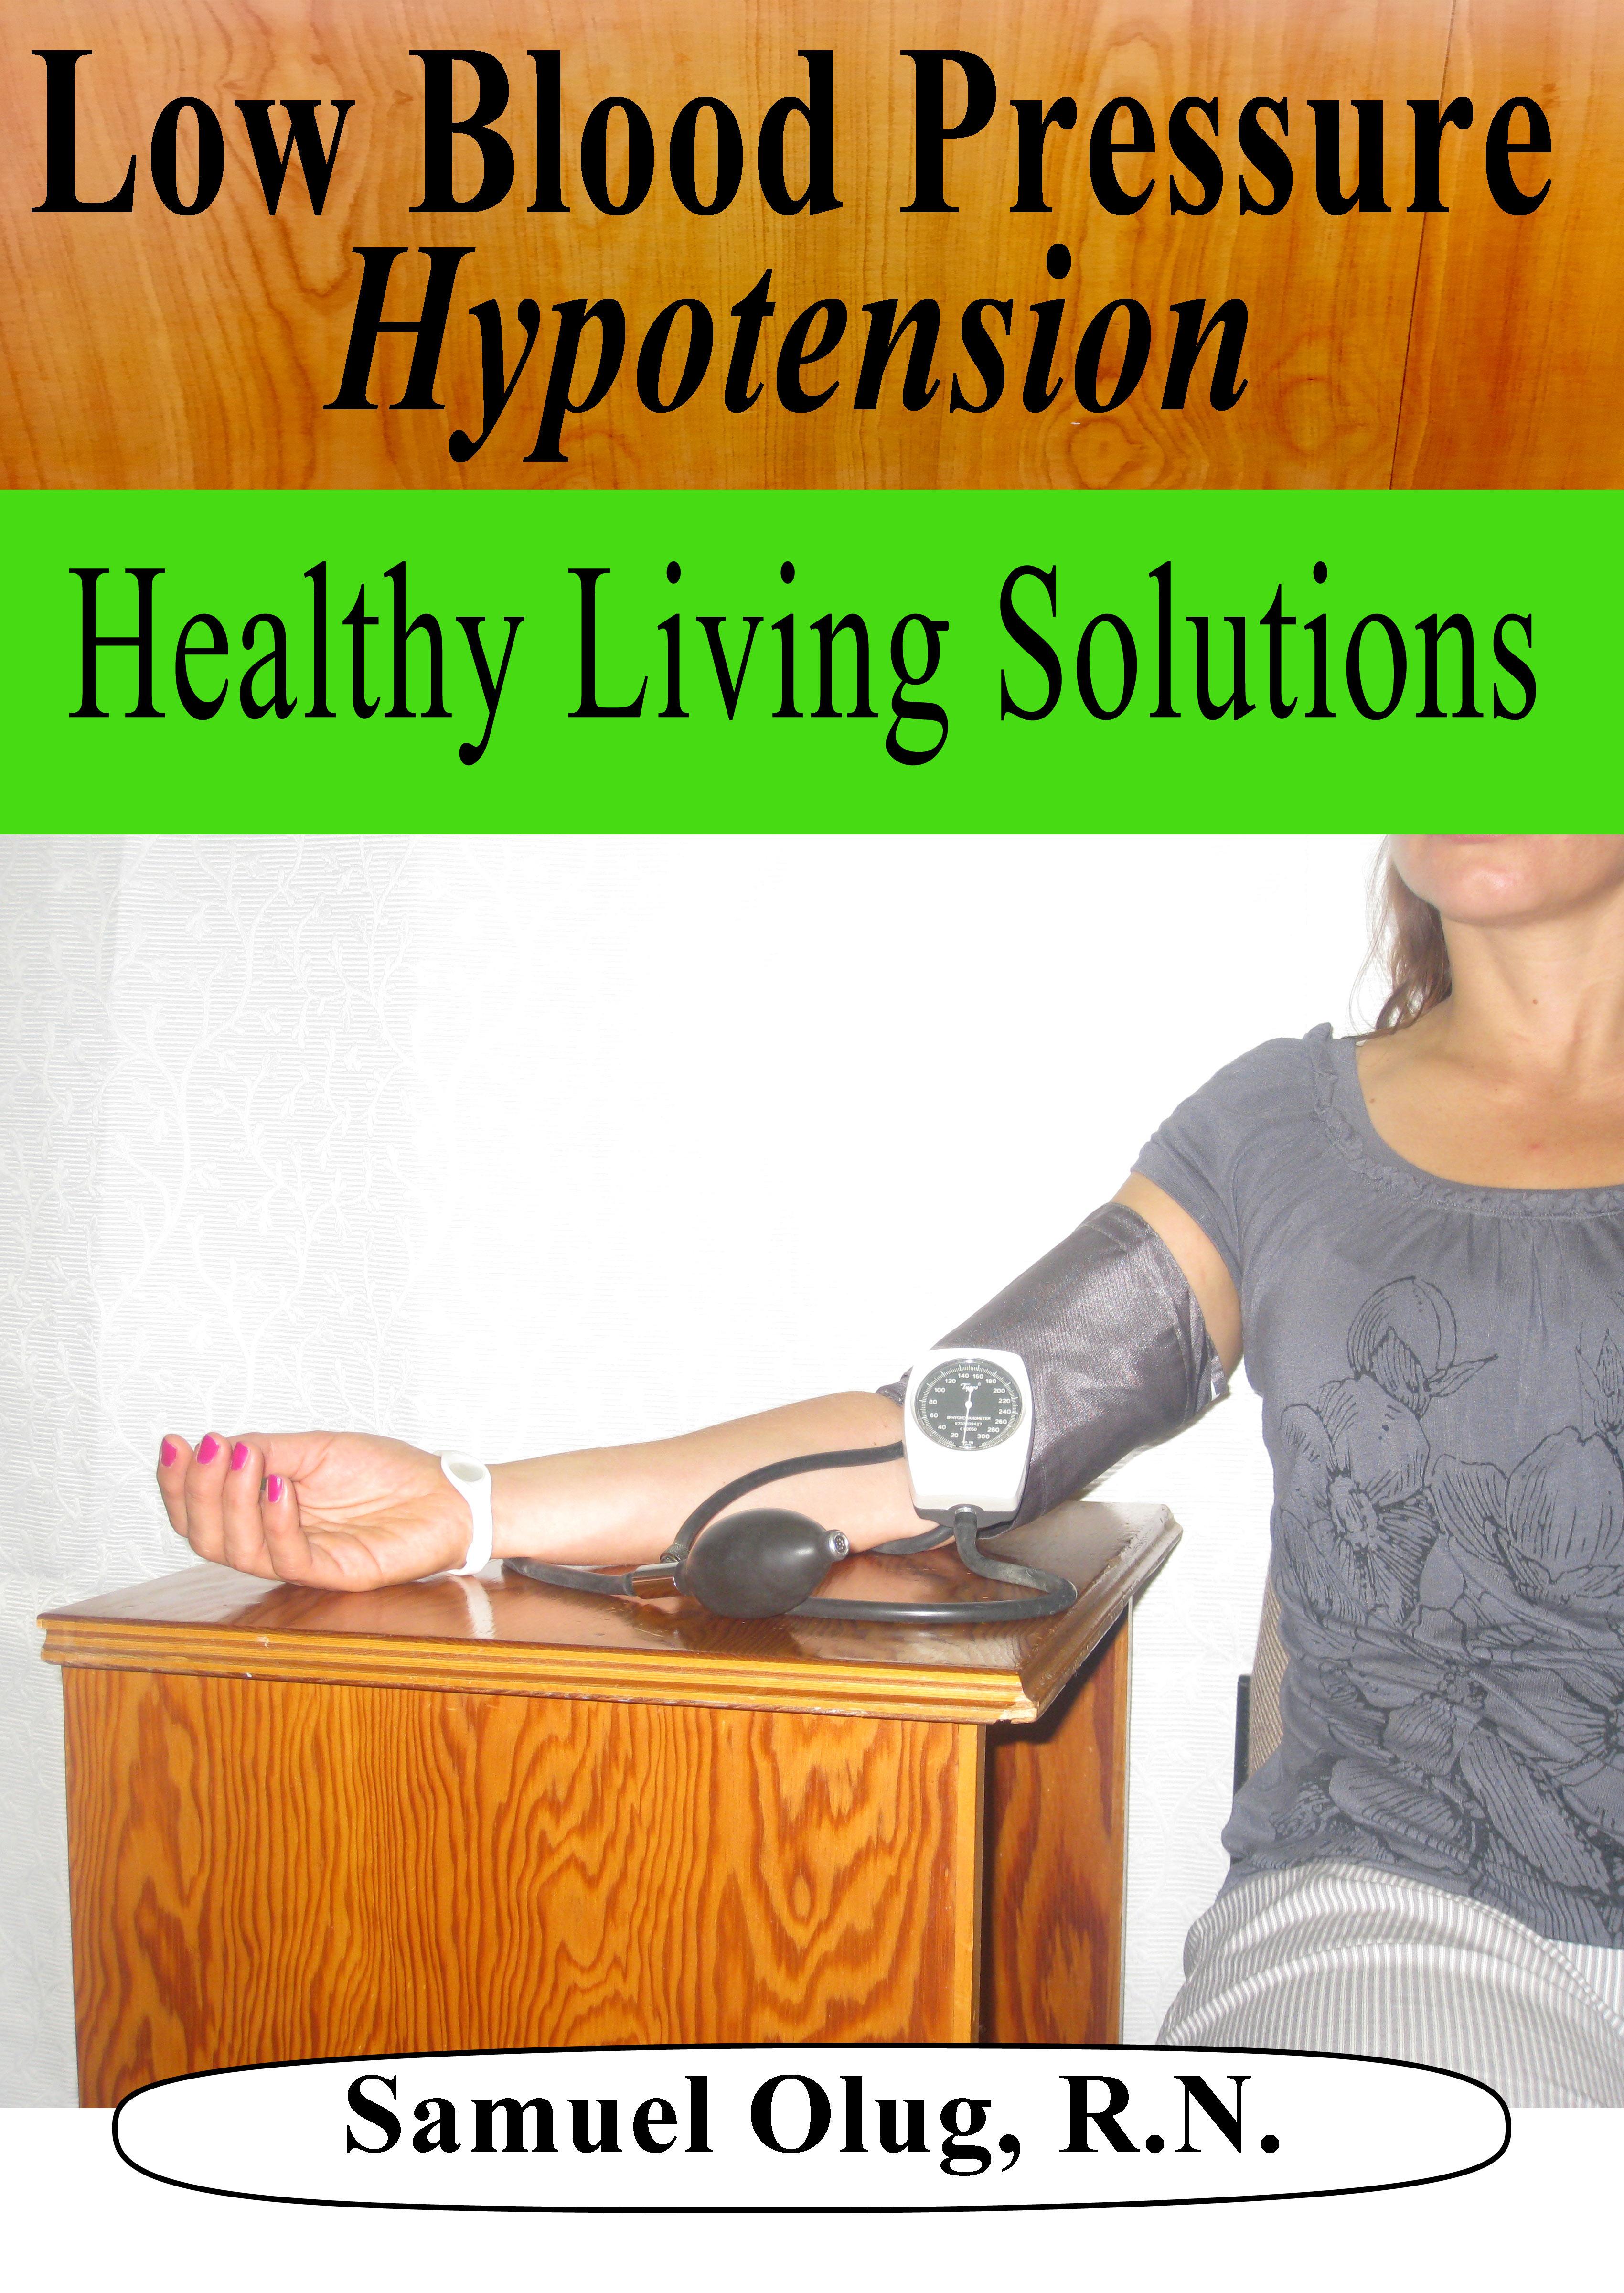 Smashwords Low Blood Pressure Hypotension A Book By Samuel Olug